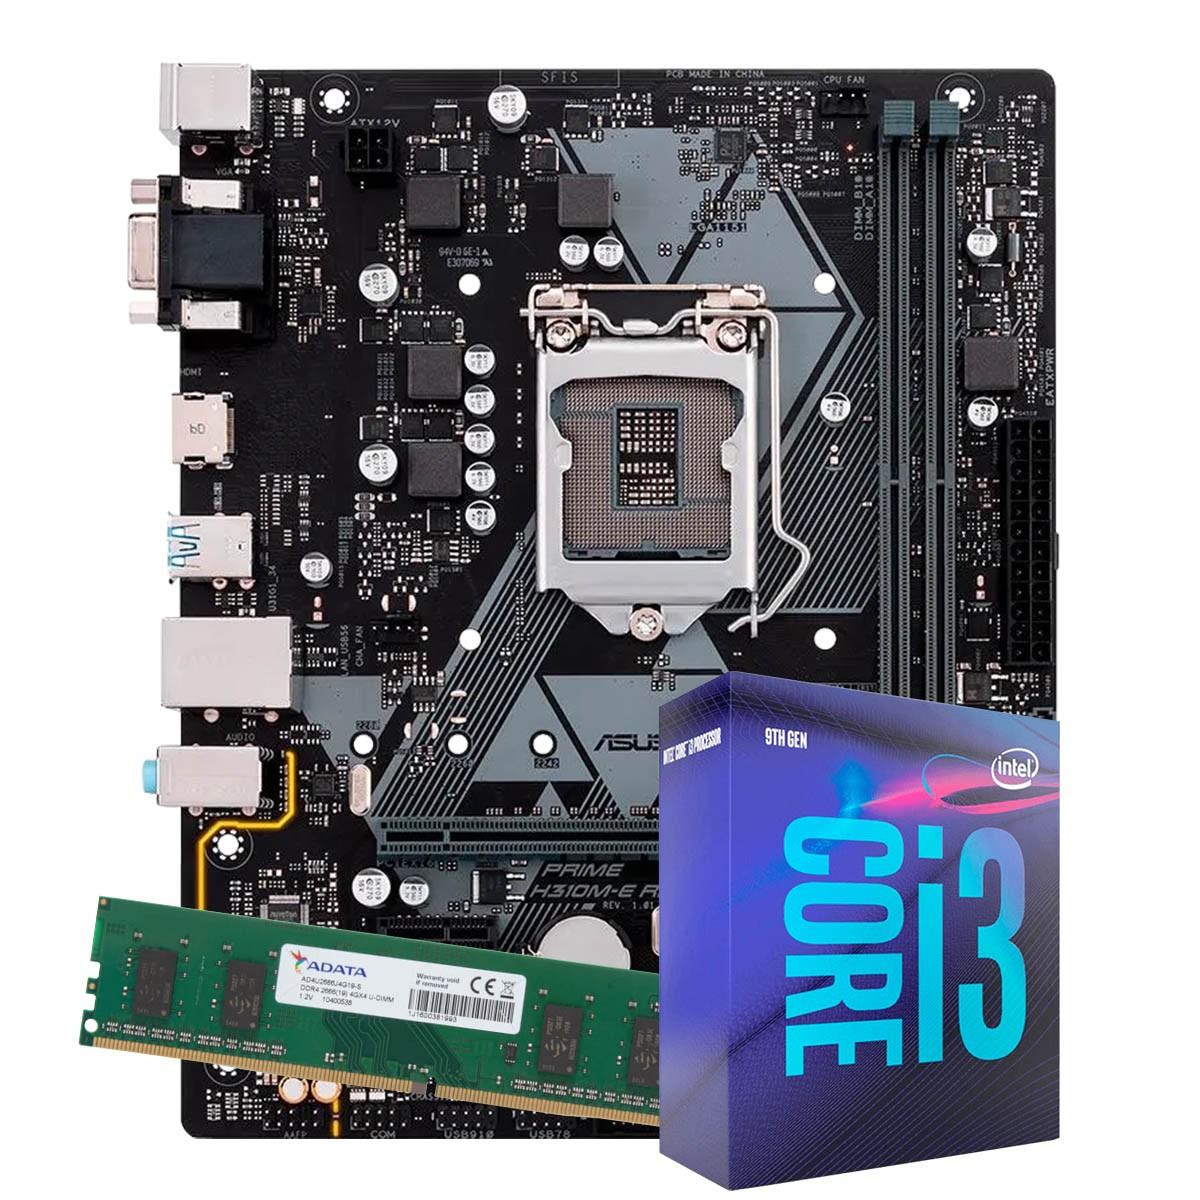 Kit Upgrade intel Corei3-8100 3.6Ghz, Placa Mãe Pcware IPMH310G  Pro LGA 1151, 4GB DDR4